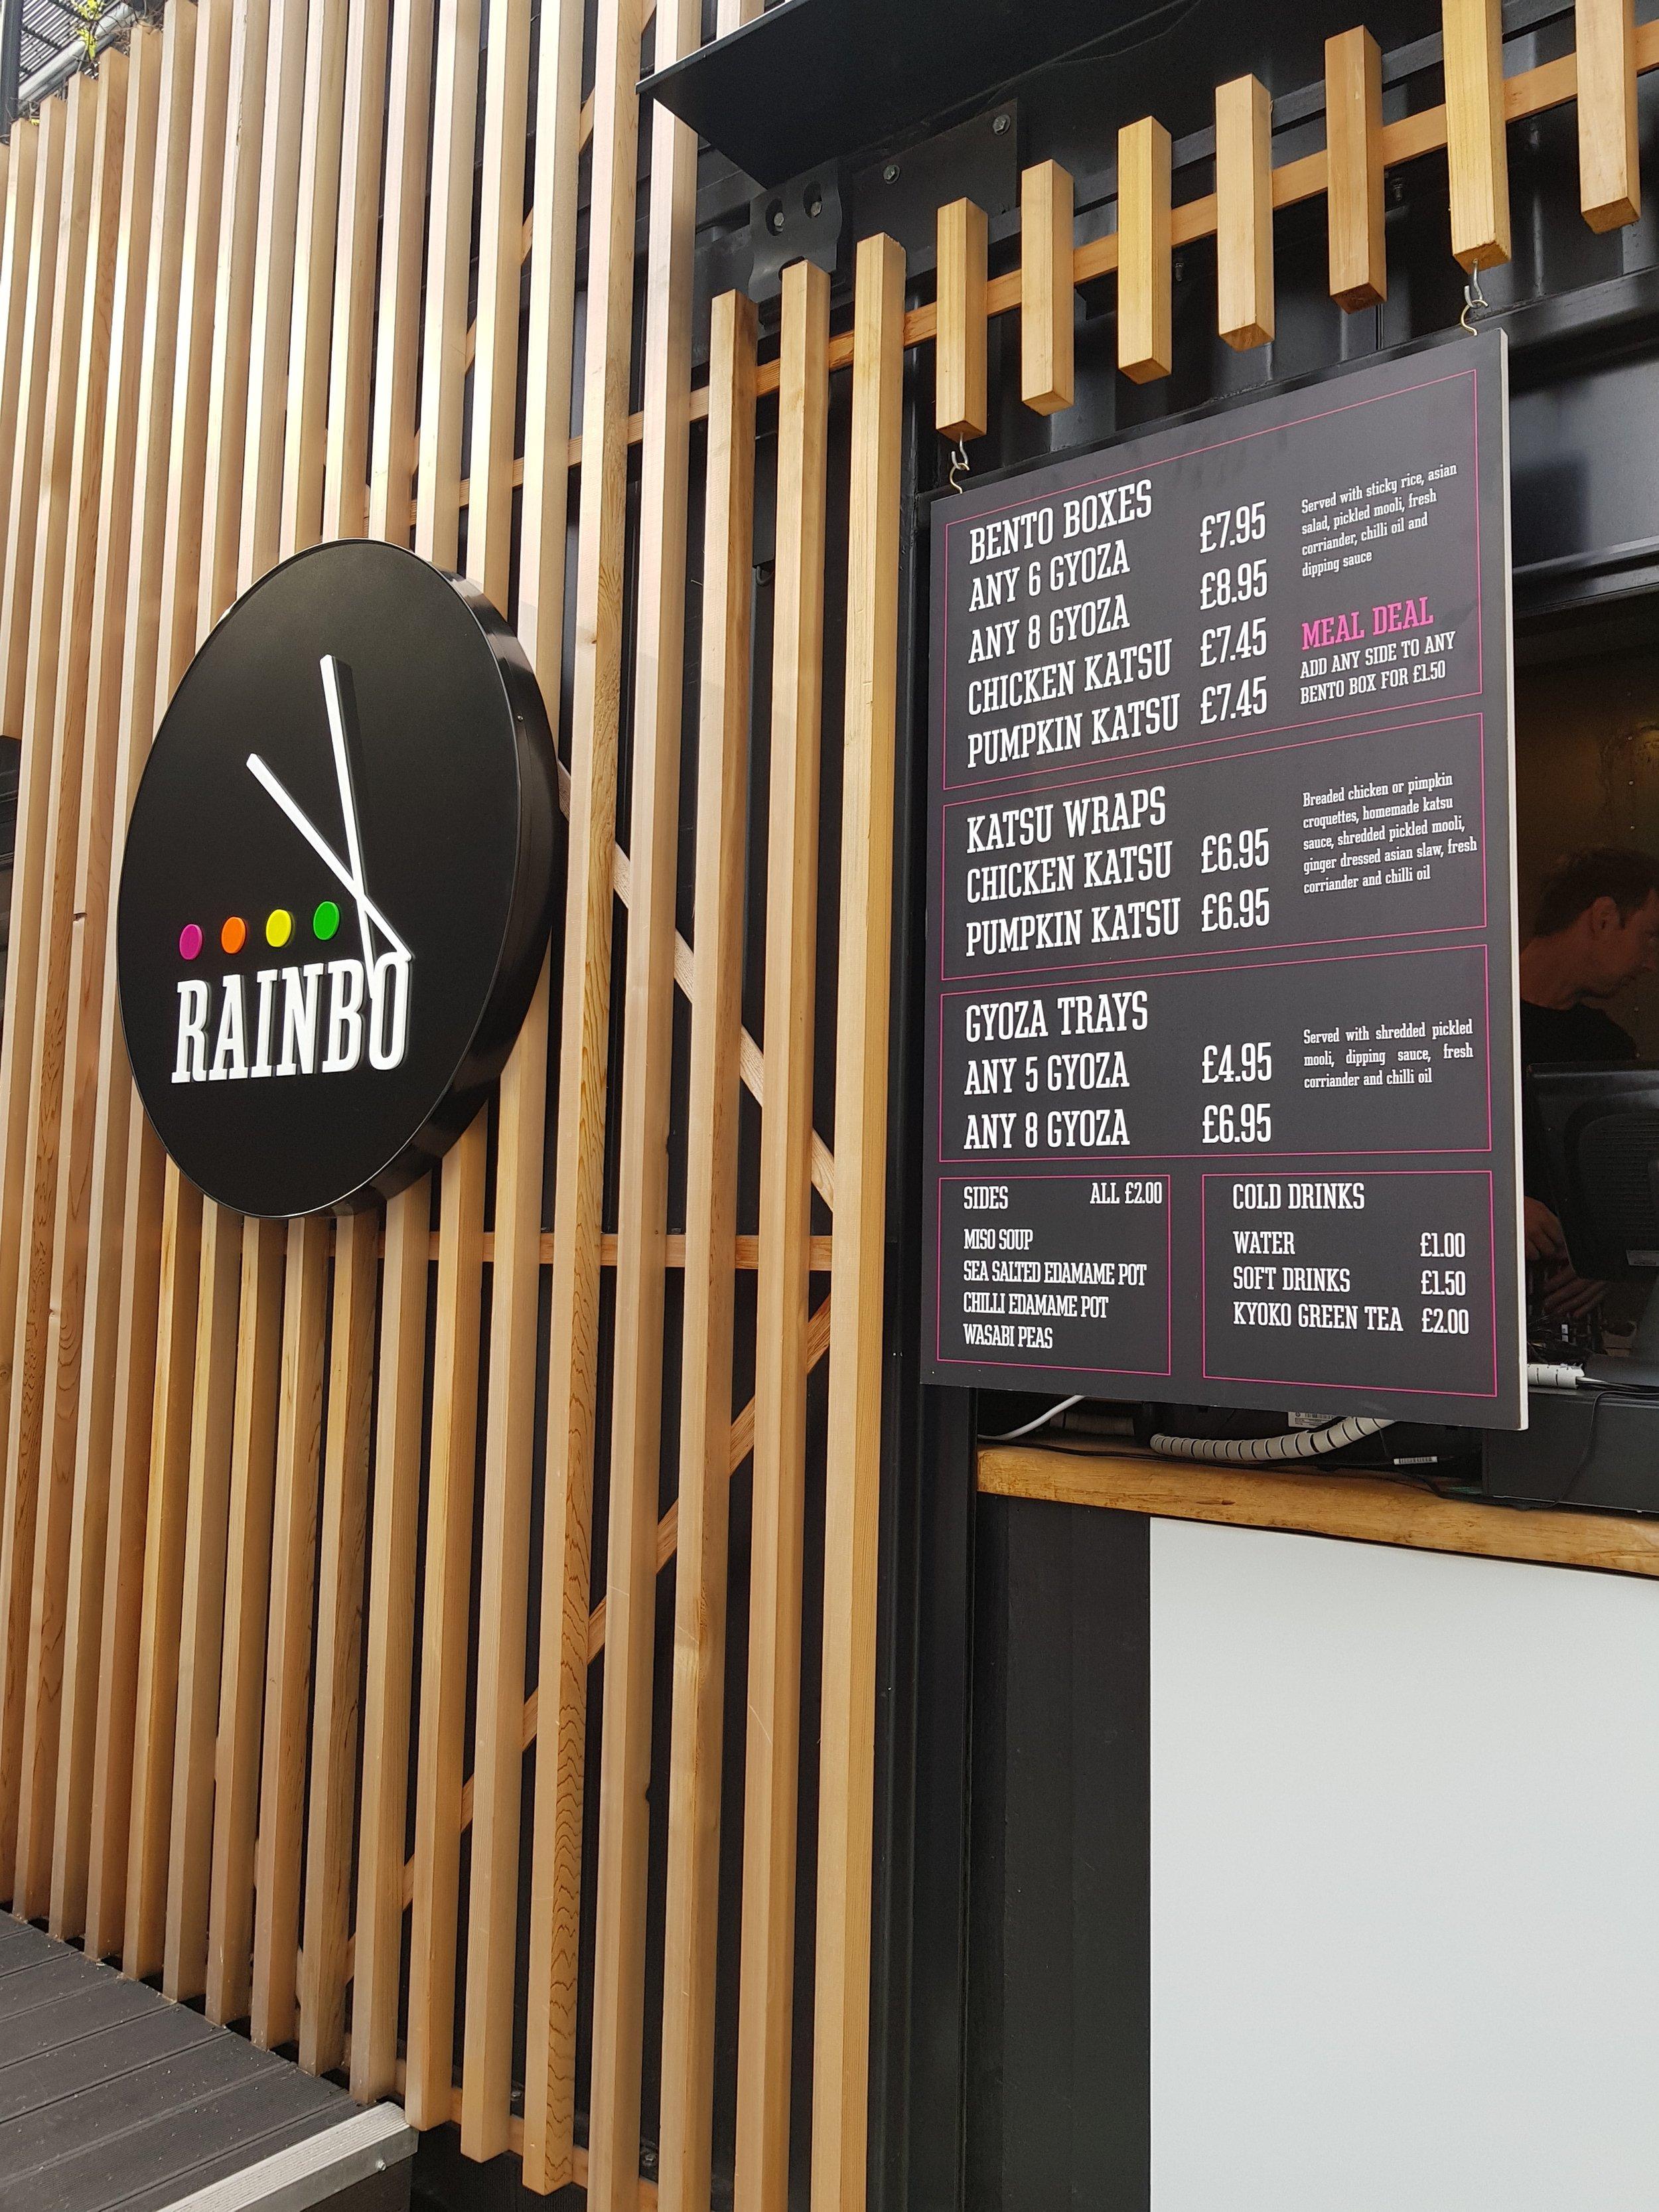 rainbo-lunch-finsbury-avenue-square-ubs-broadgate-gyoza-menu.jpg